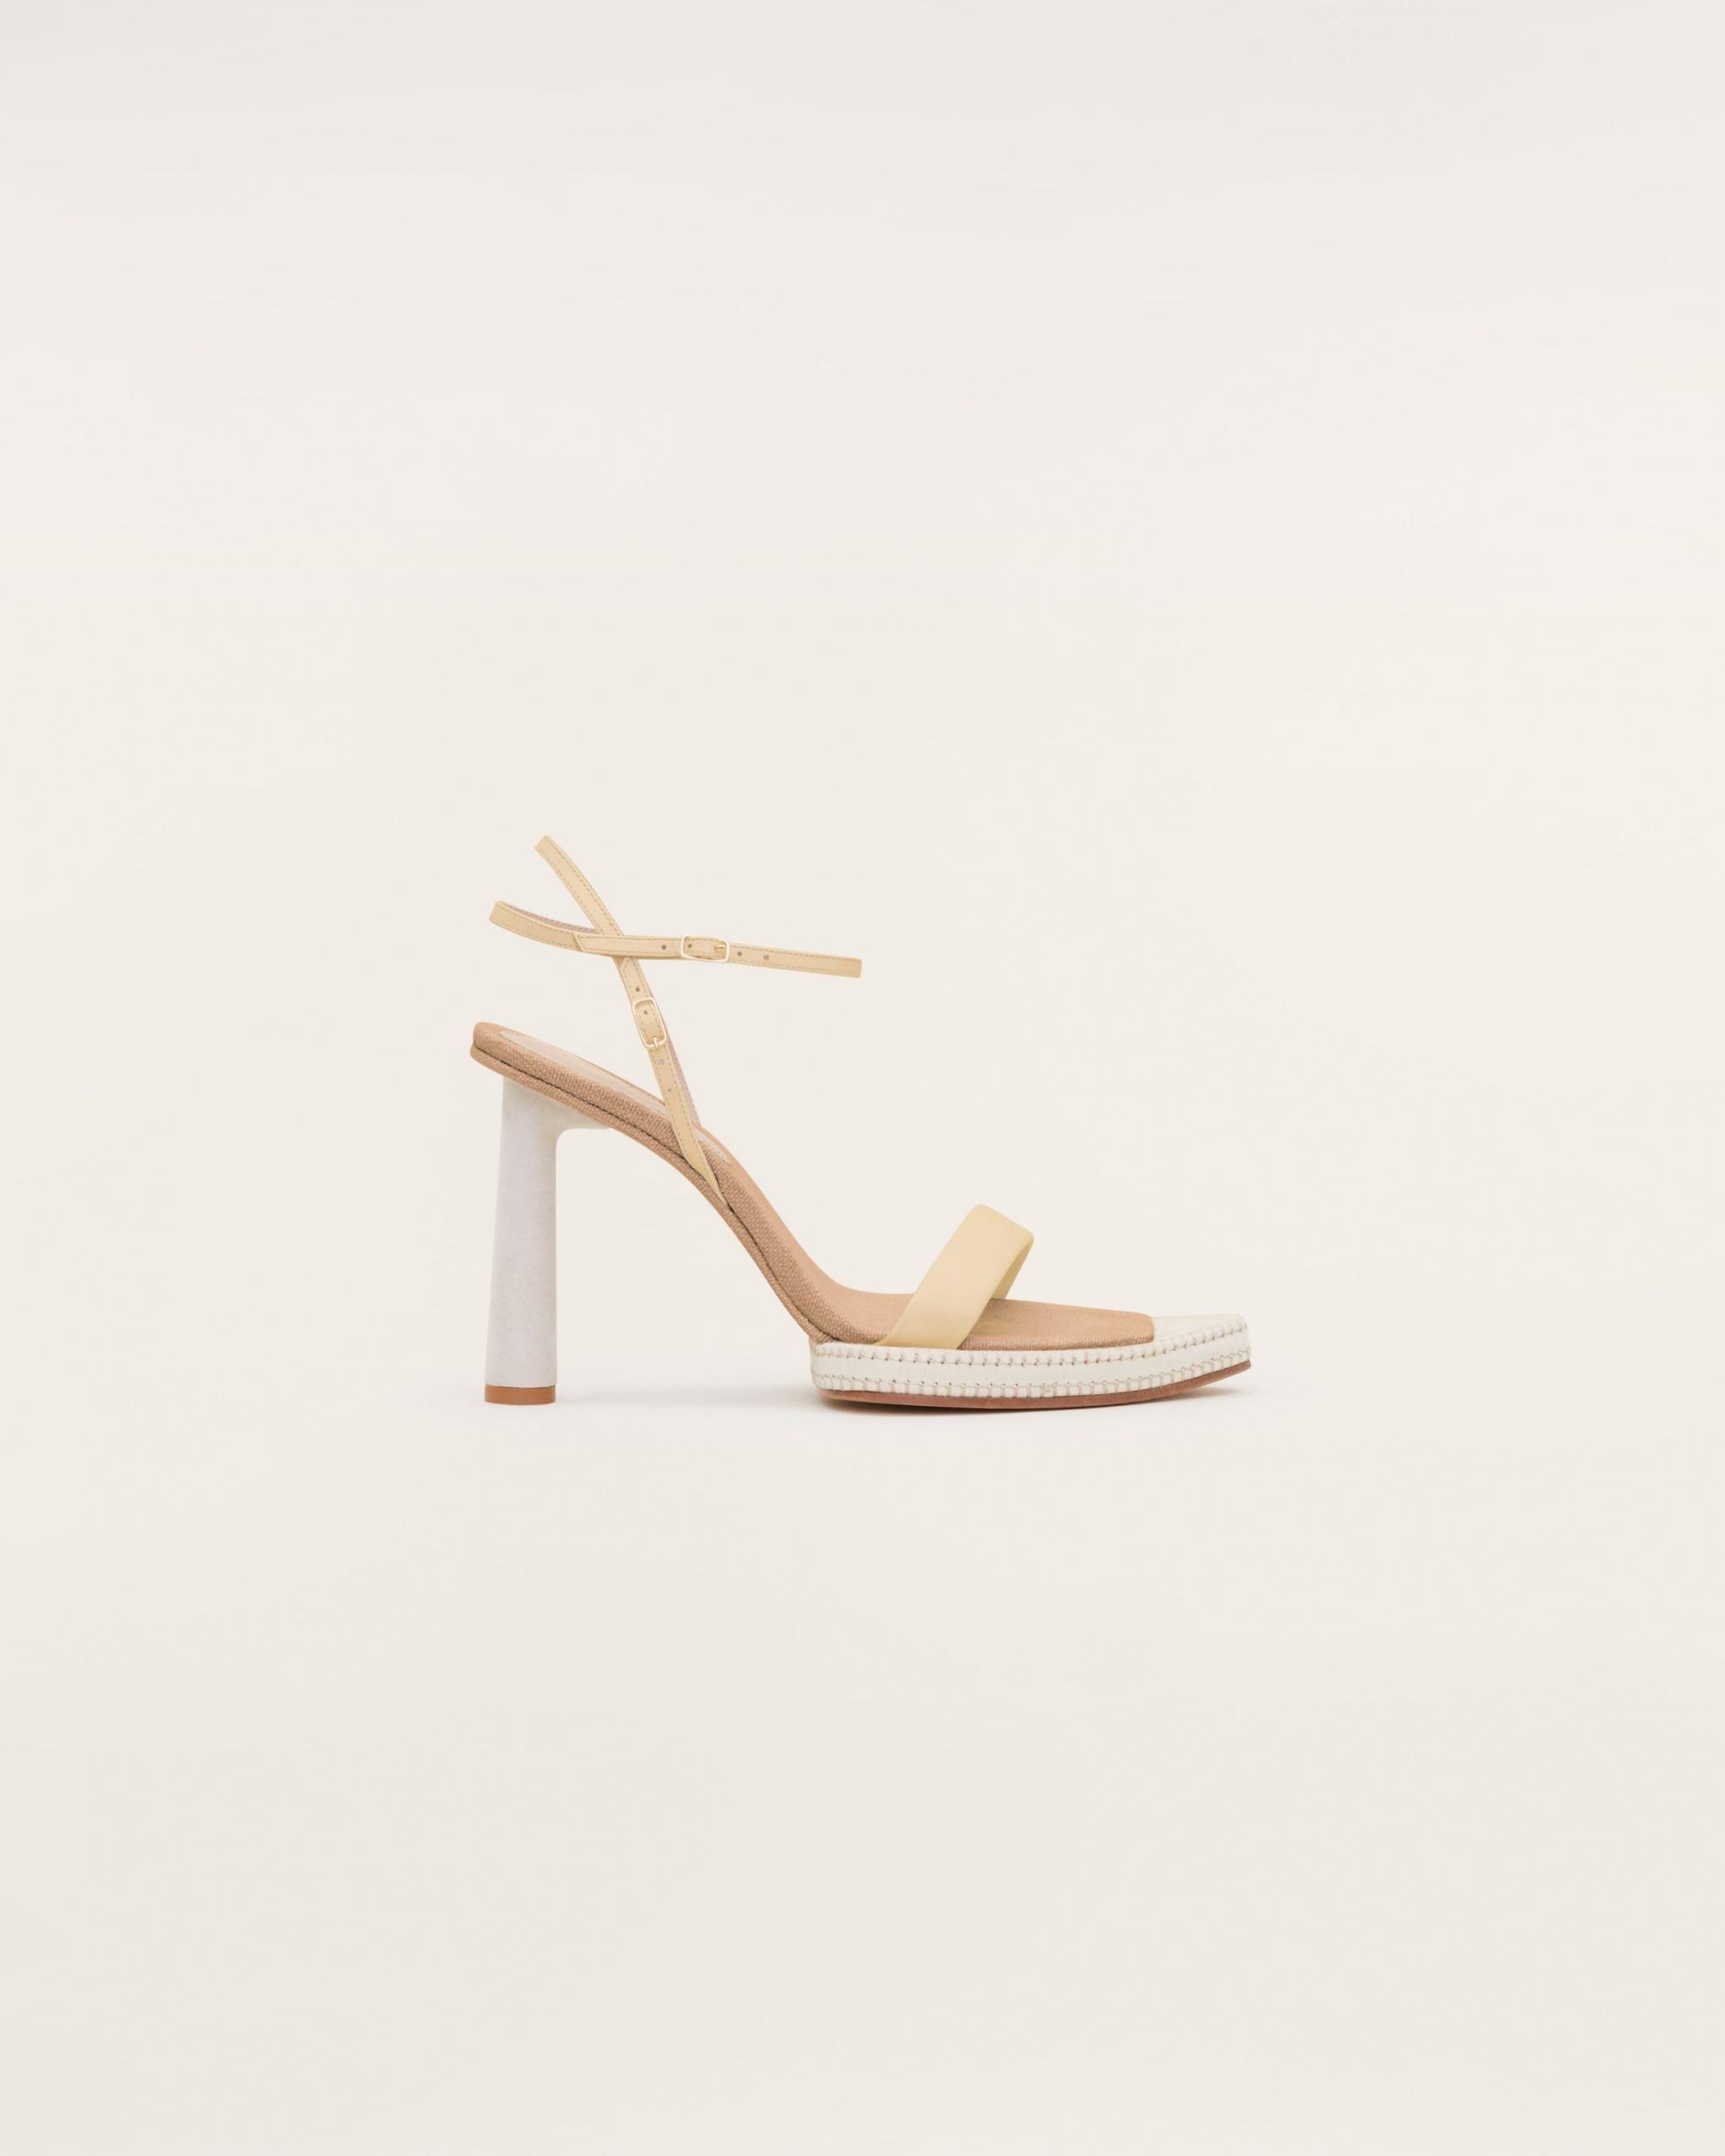 Les sandales Novio